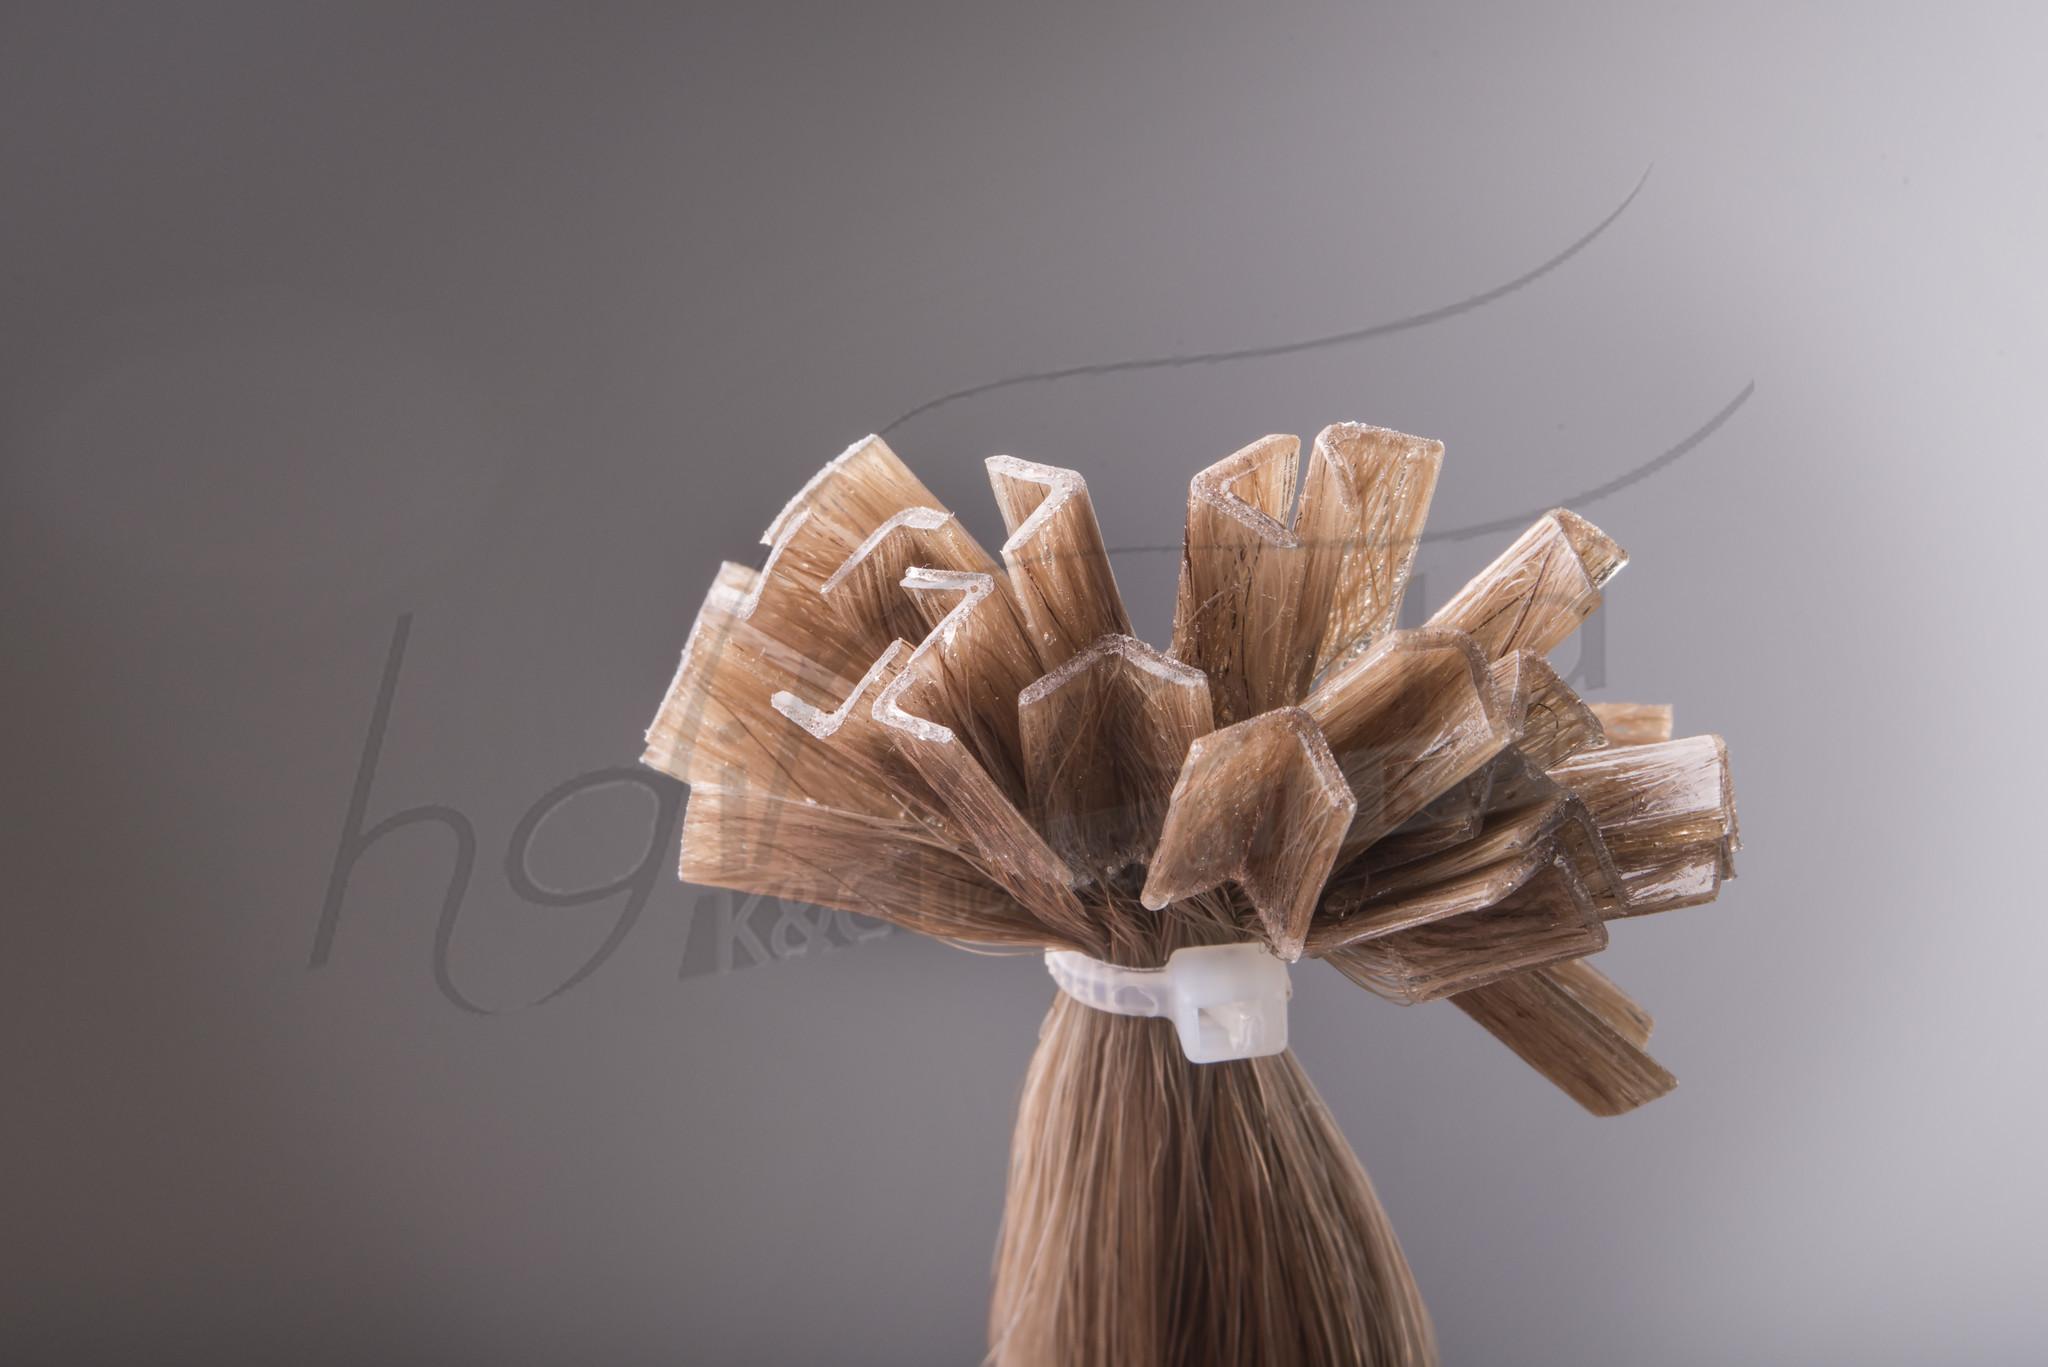 SilverFox Wax Extensions Loose Wave 55cm #12 Ash Blonde